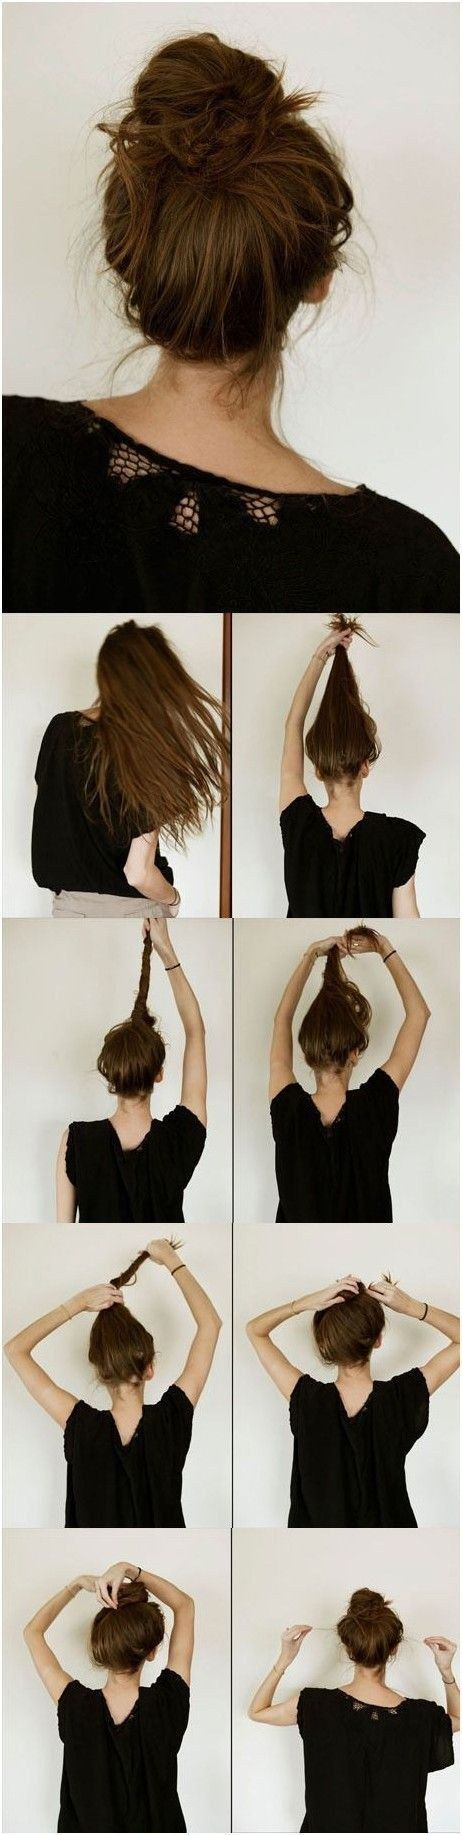 Enrolla tu top knot. | 17 Peinados sencillos para dominar tu cabello